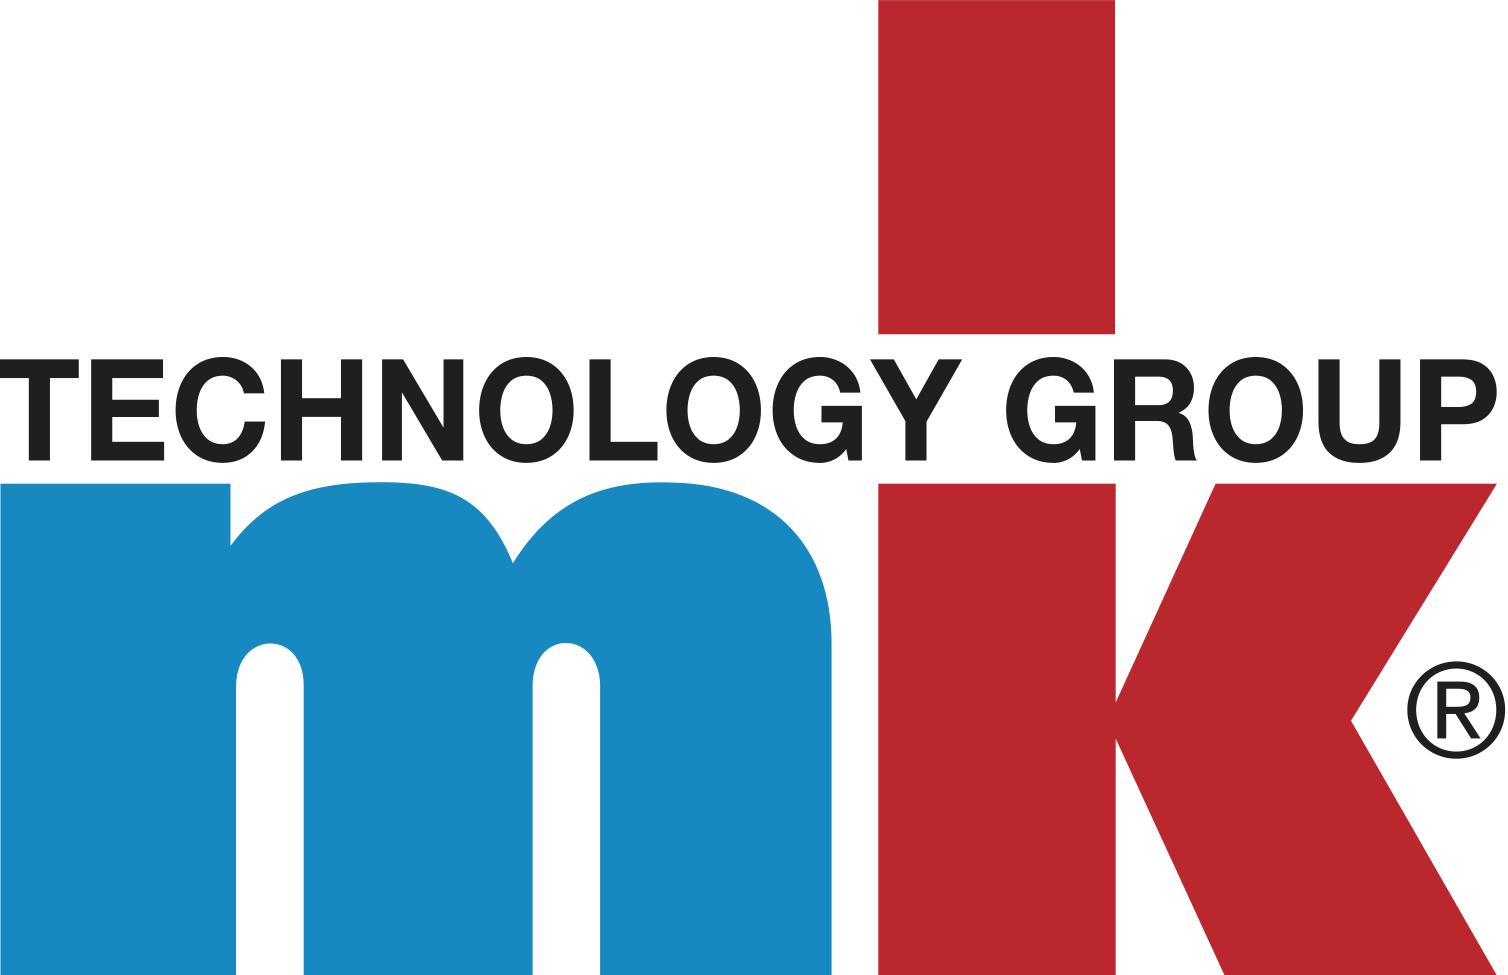 mk Technology Group